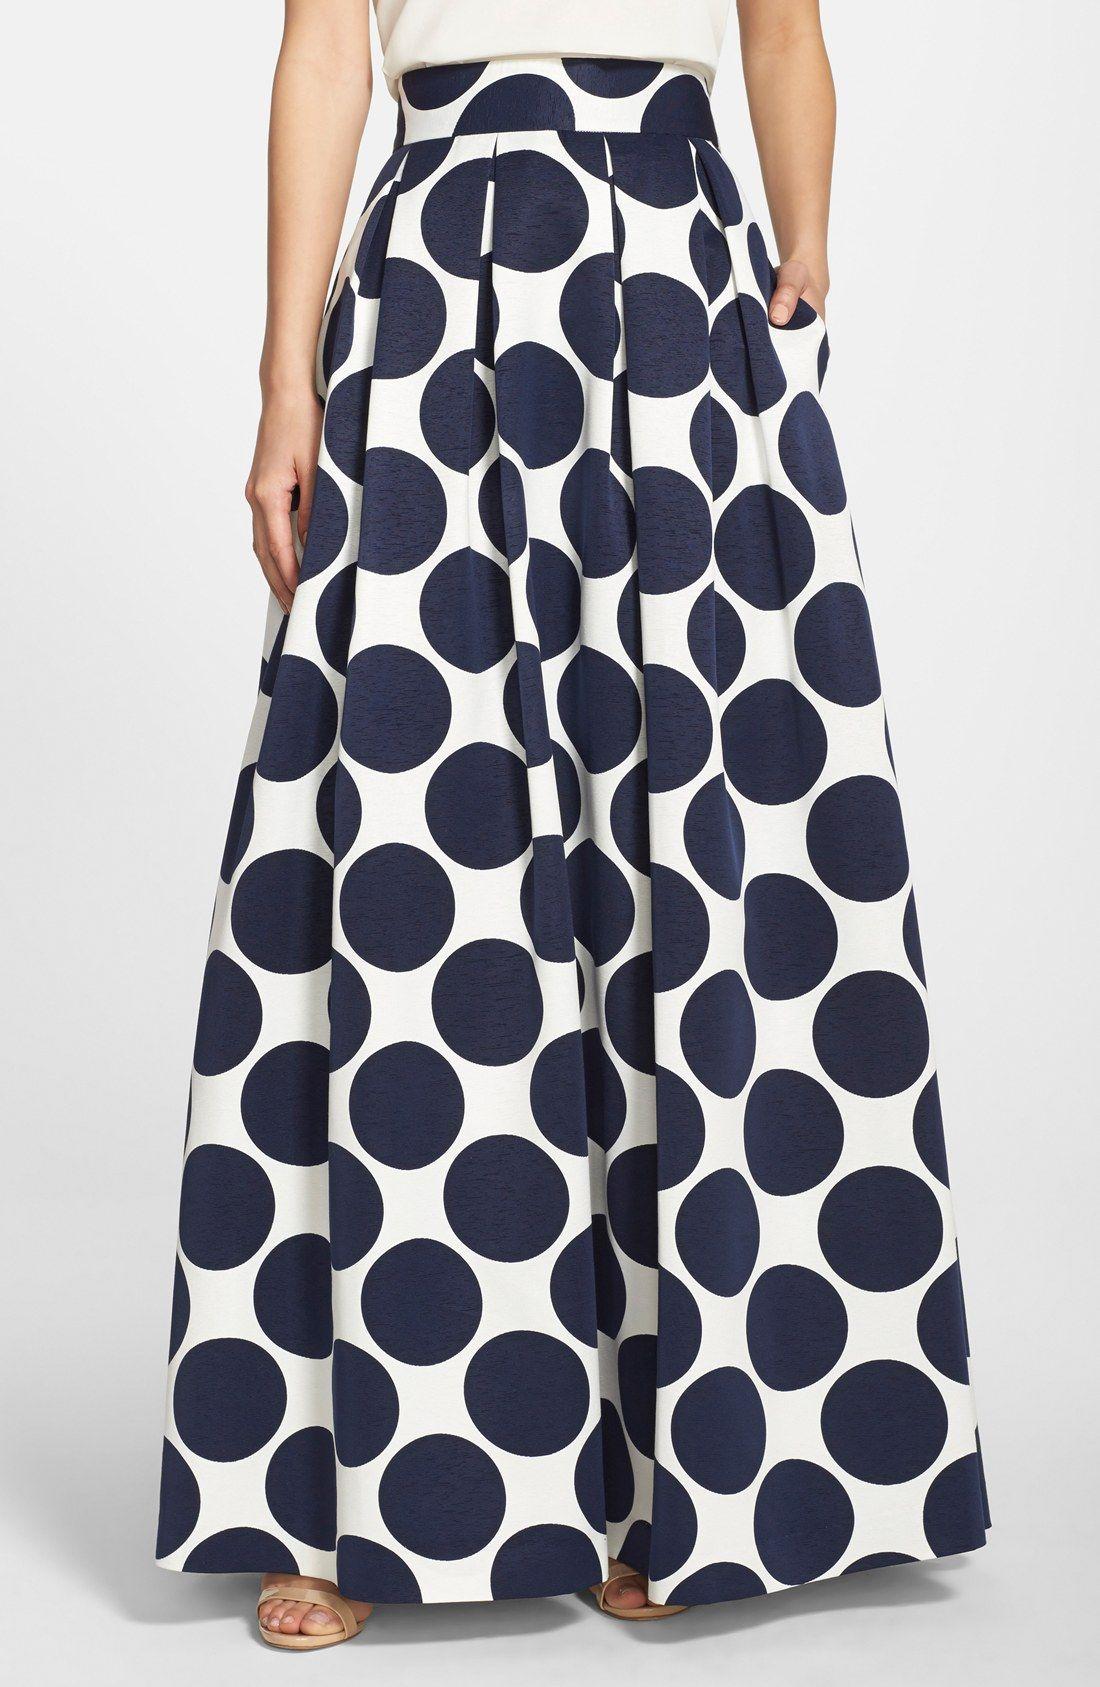 Eliza j pleated dot print ball skirt nordstrom sew what